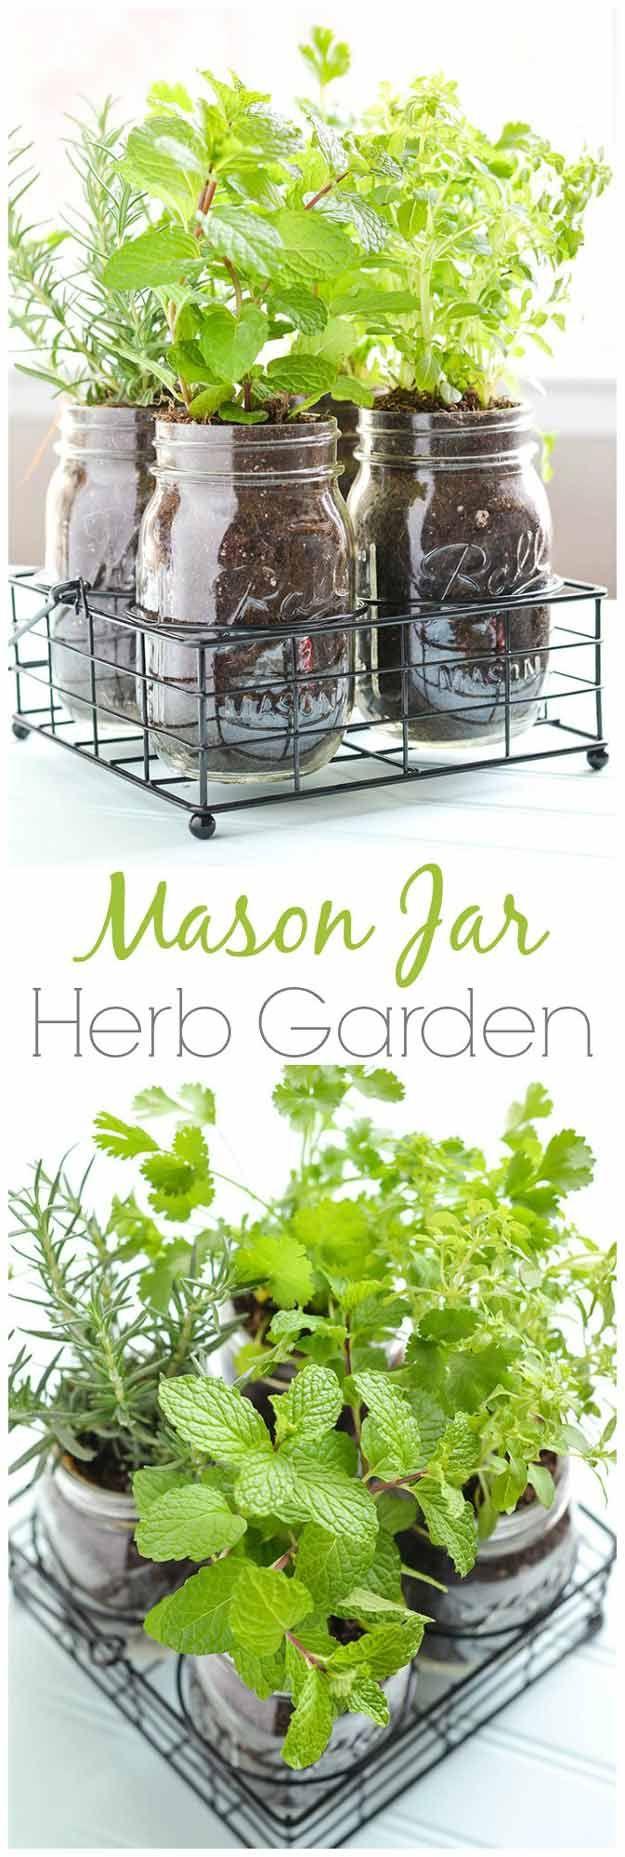 Indoor Herb Garden Ideas Horta Jardinagem E Jardins ~ Horta De Temperos Na Cozinha